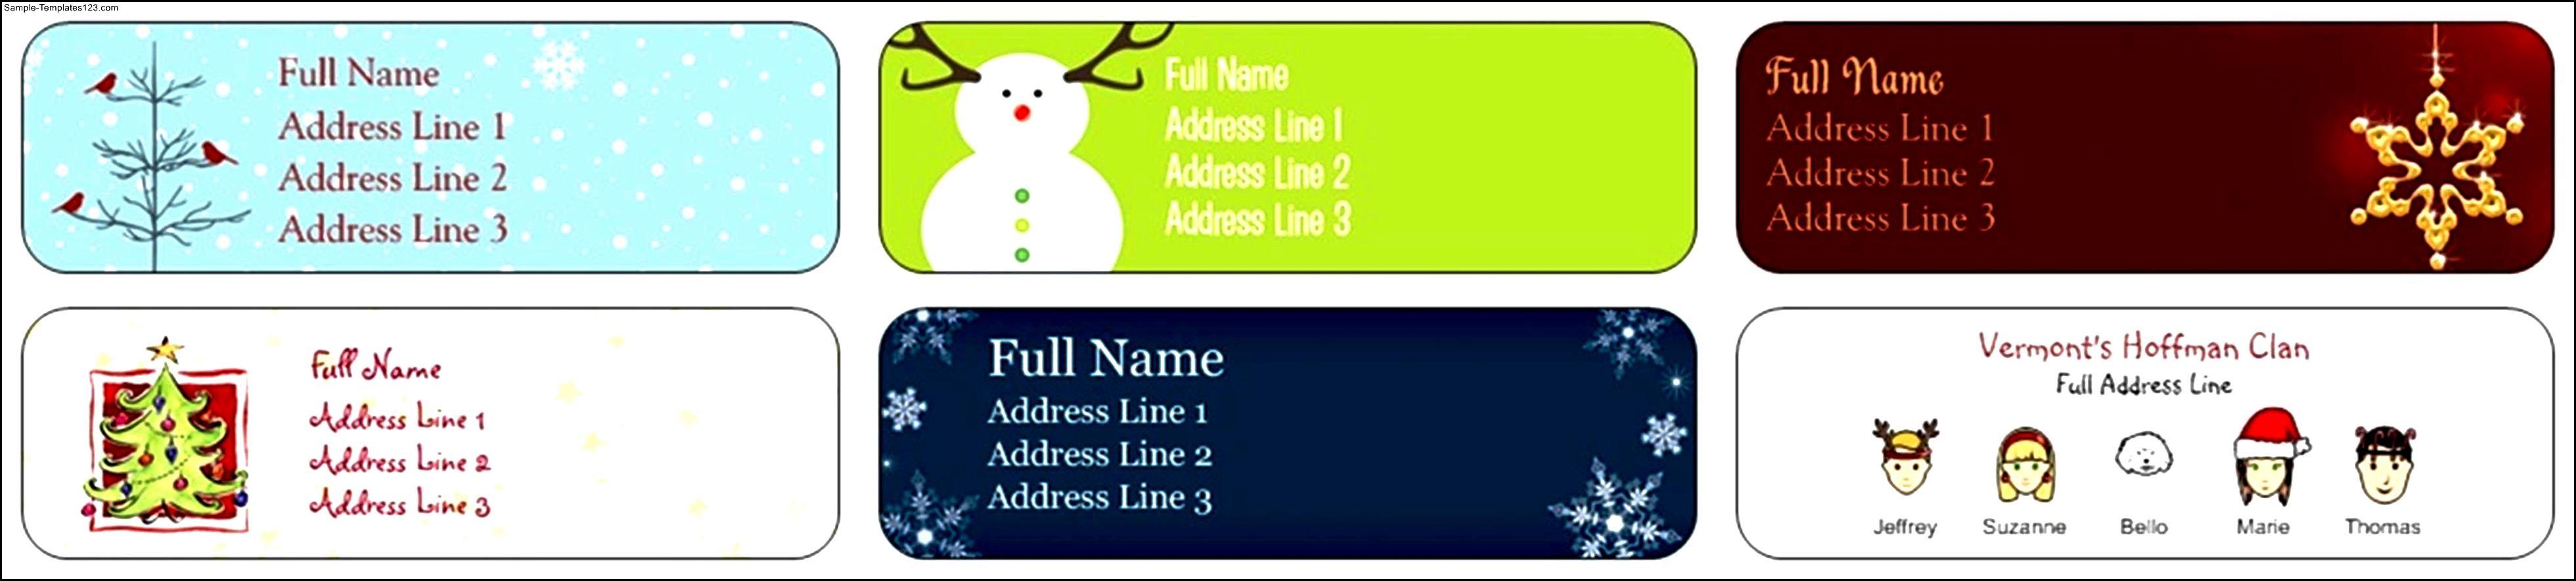 Free return address label template sample templates sample templates for Free return address label templates